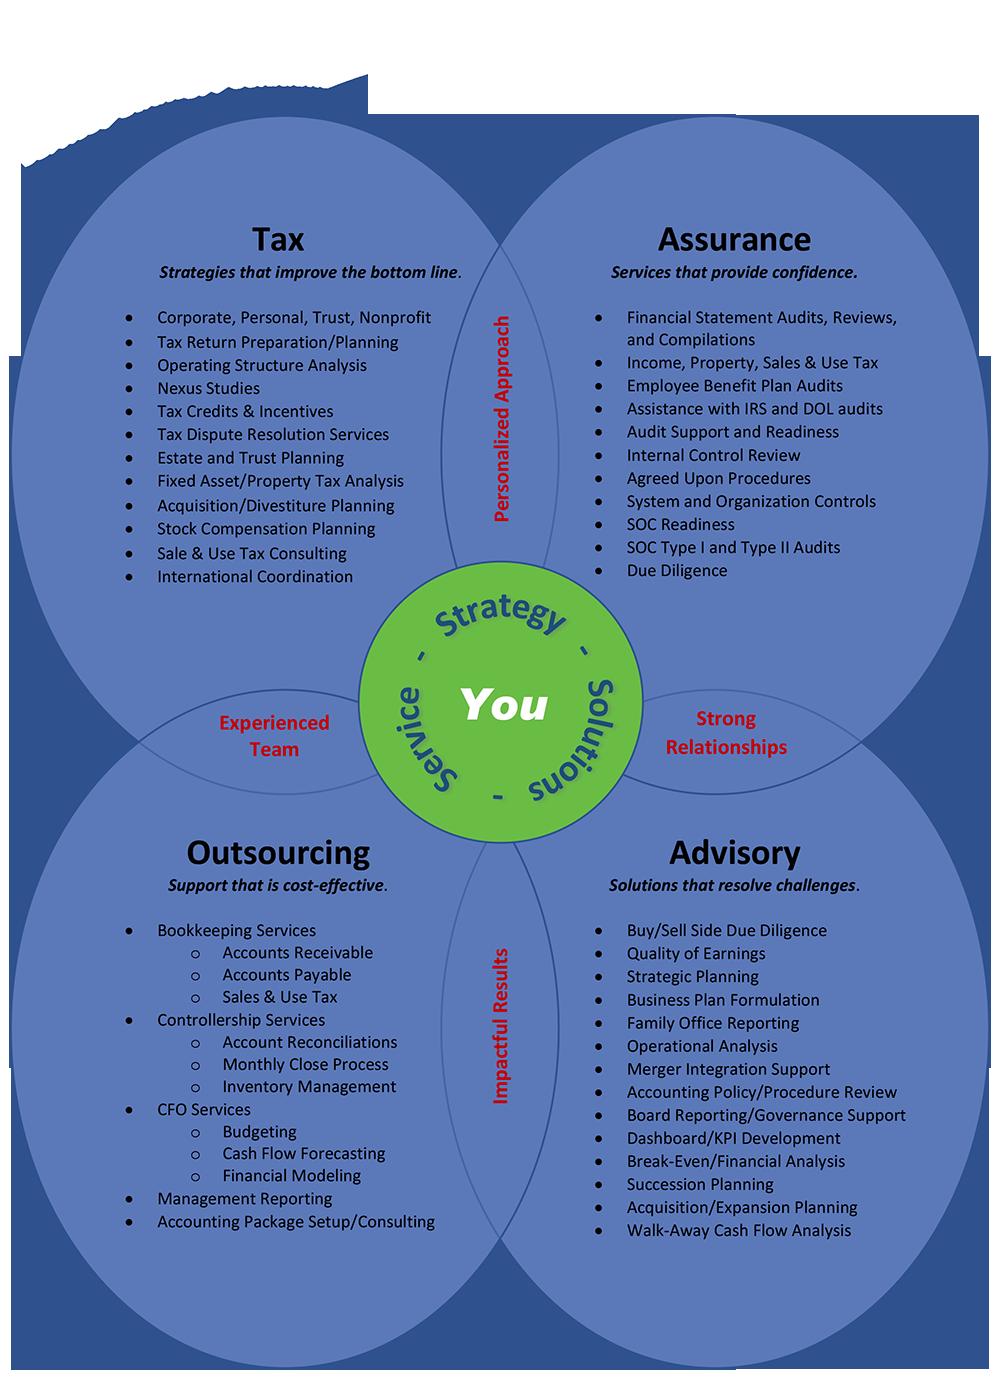 Waukesha, WI Firm | Services Page | Quandt Berndt & Company, LLC